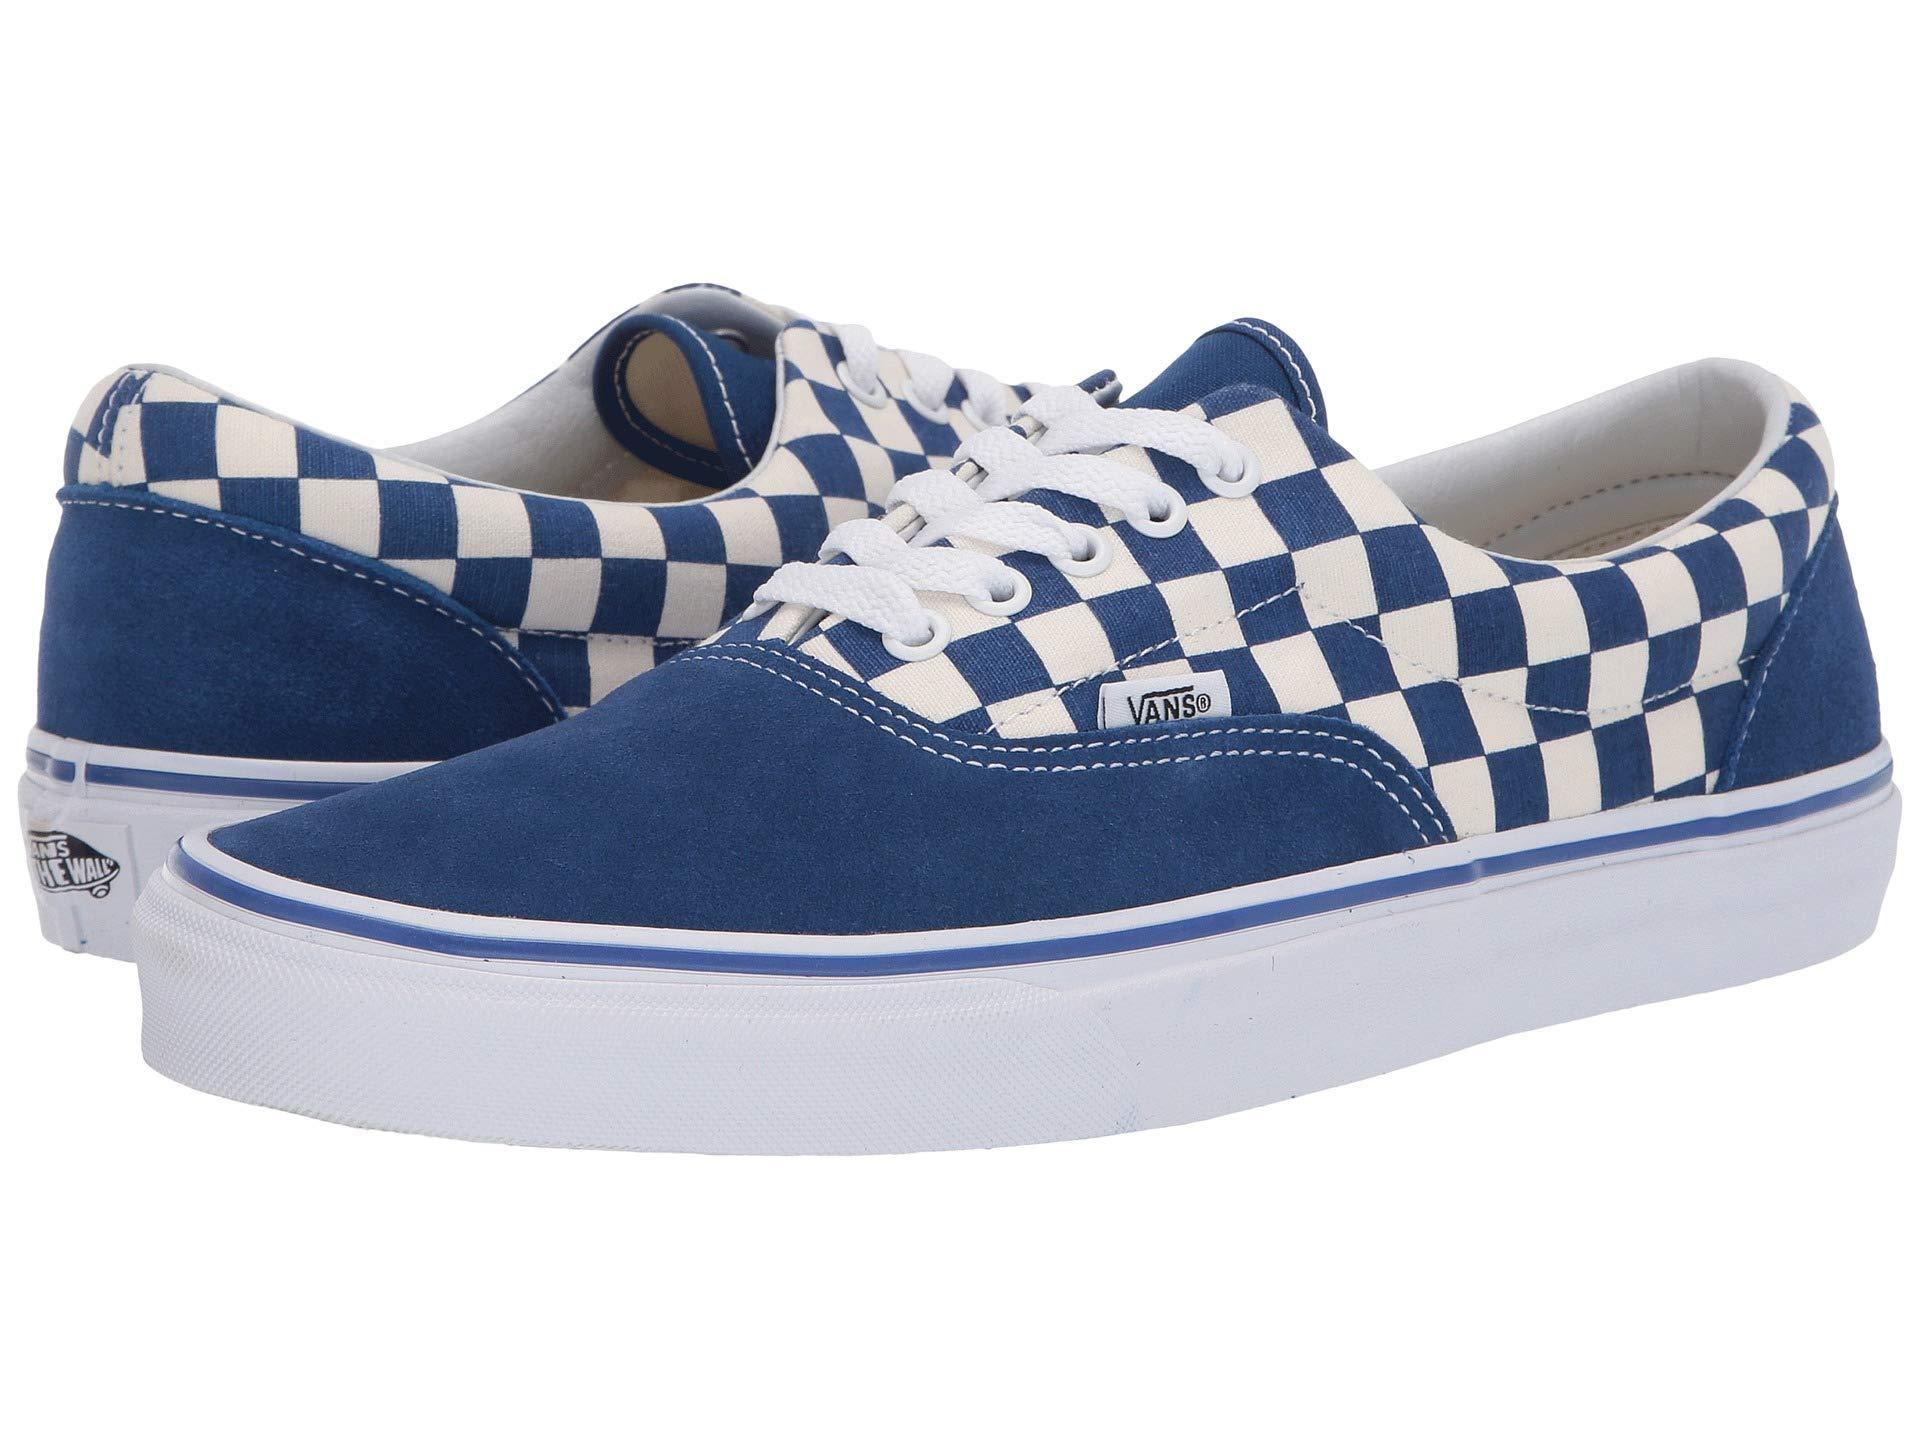 a0a45c9451 Lyst - Vans Eratm ((checkerboard) Multi true White) Skate Shoes in ...